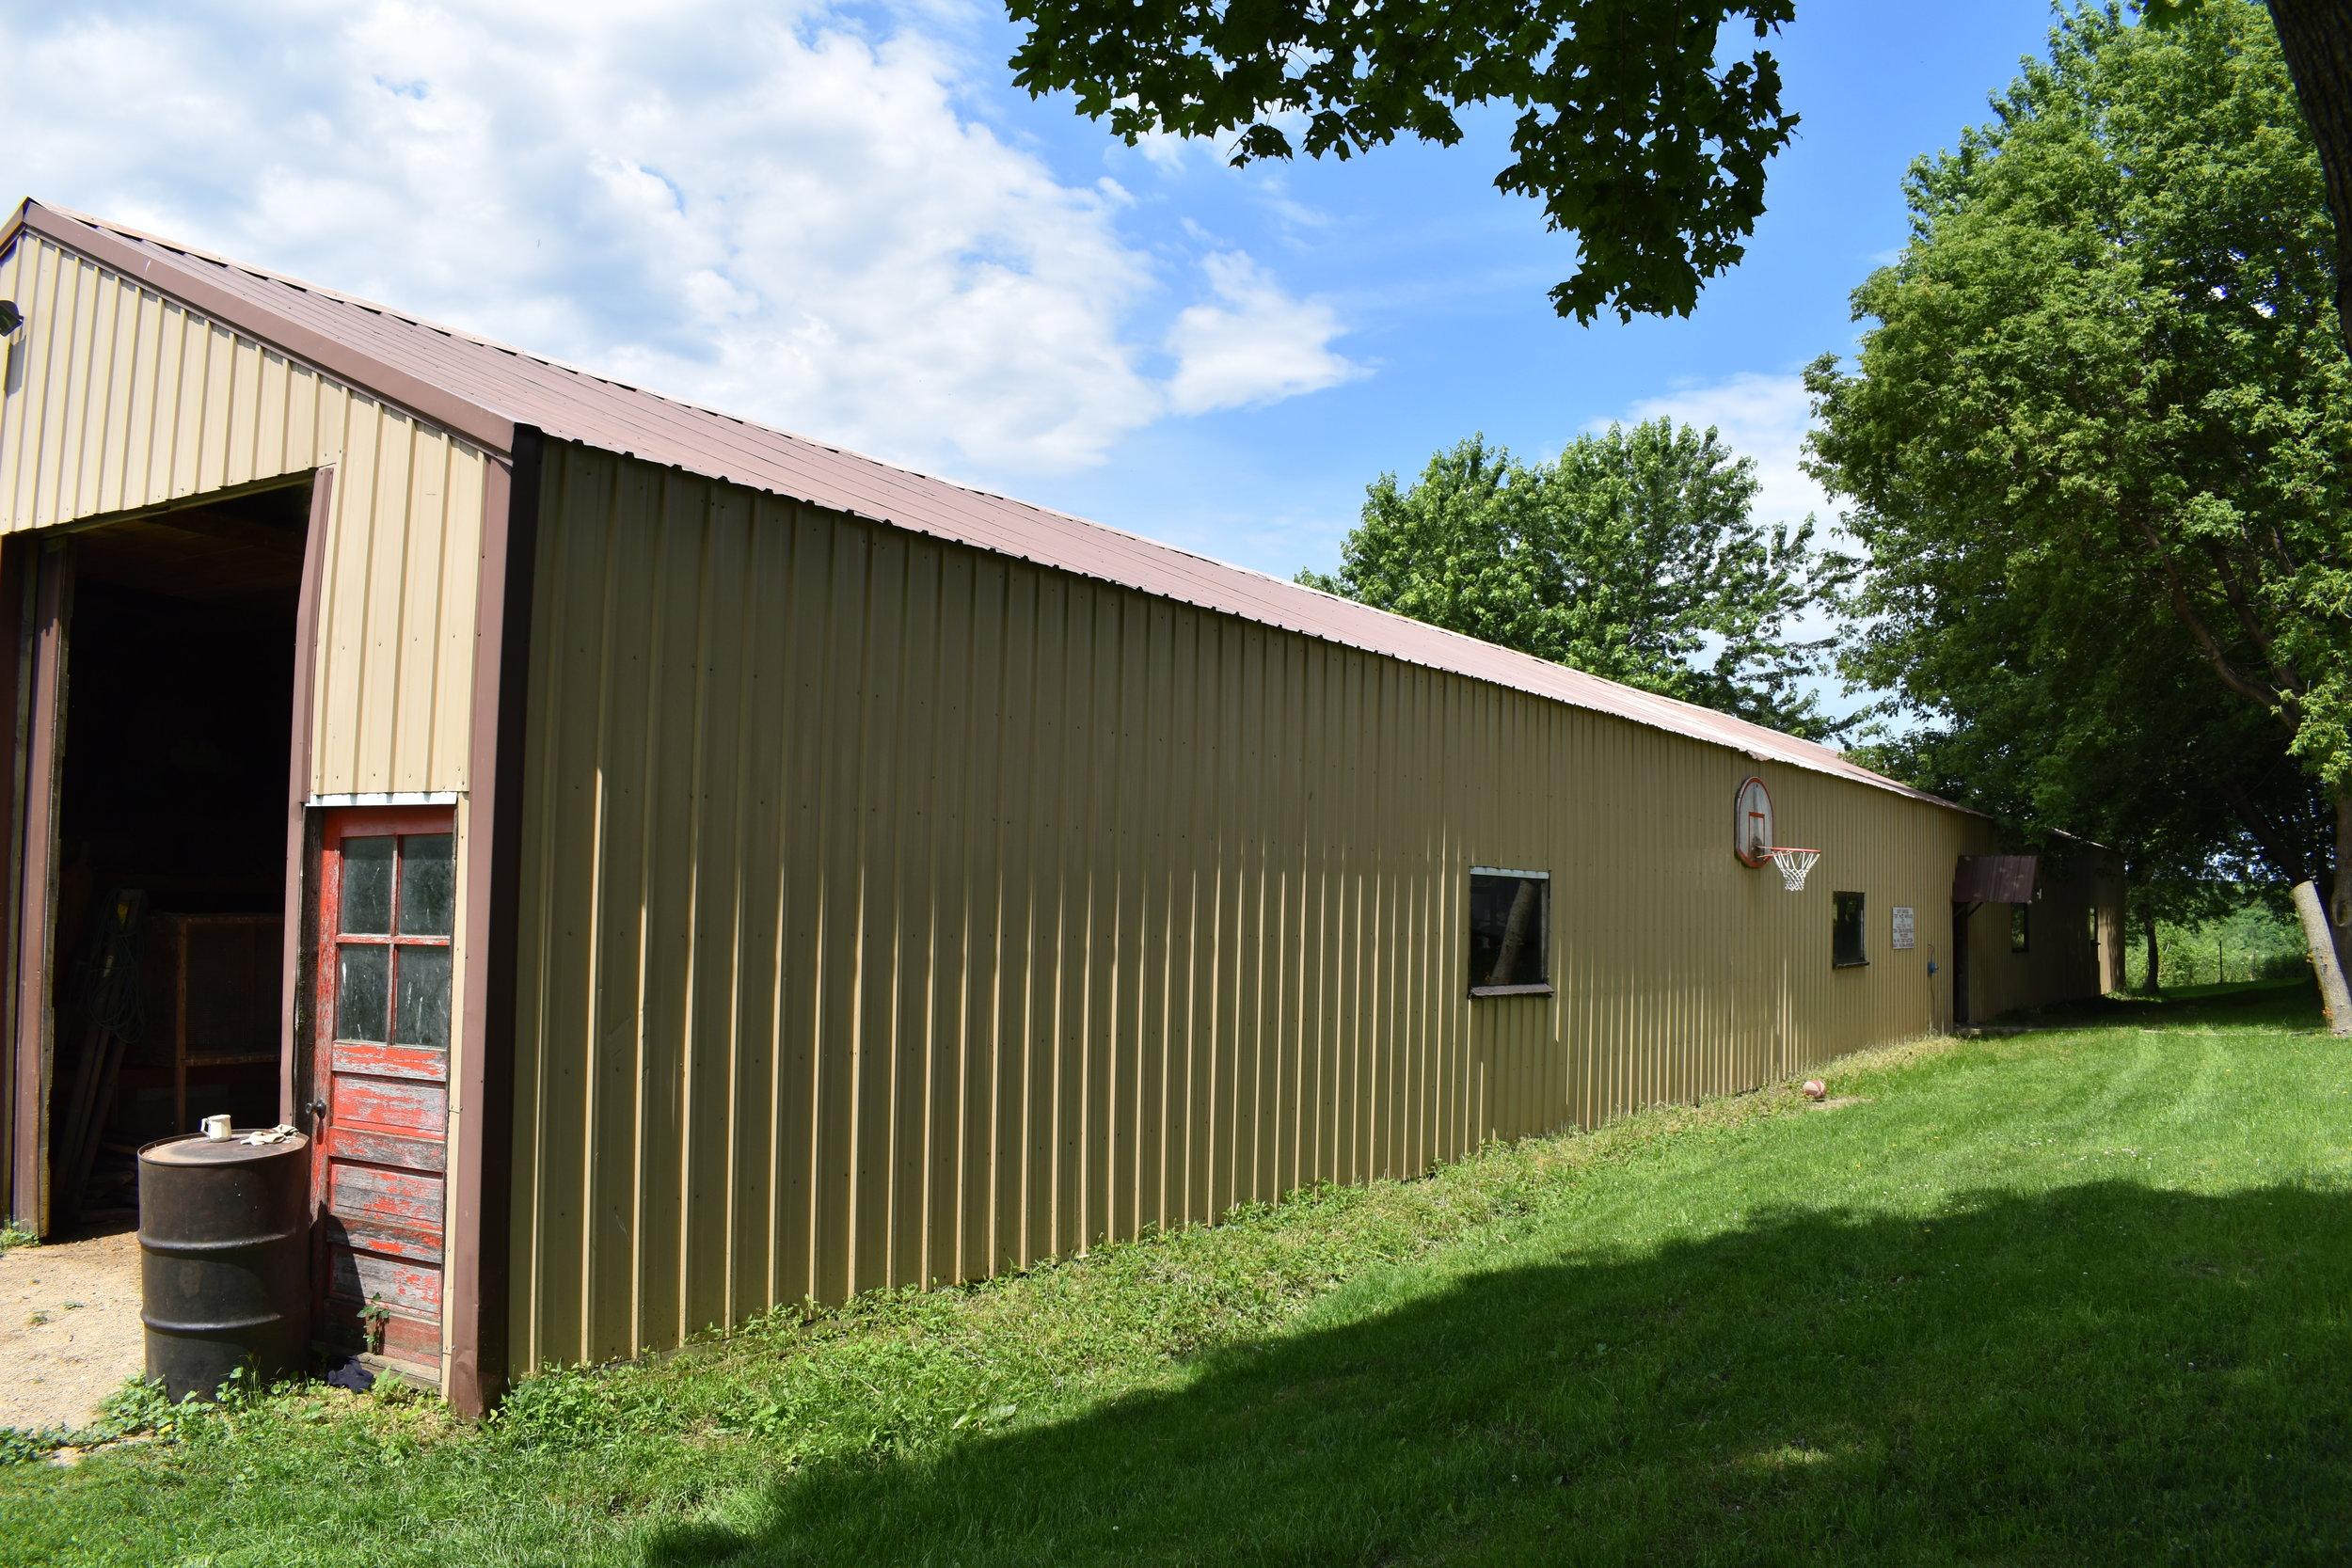 Old barracks building from Ft. McCoy